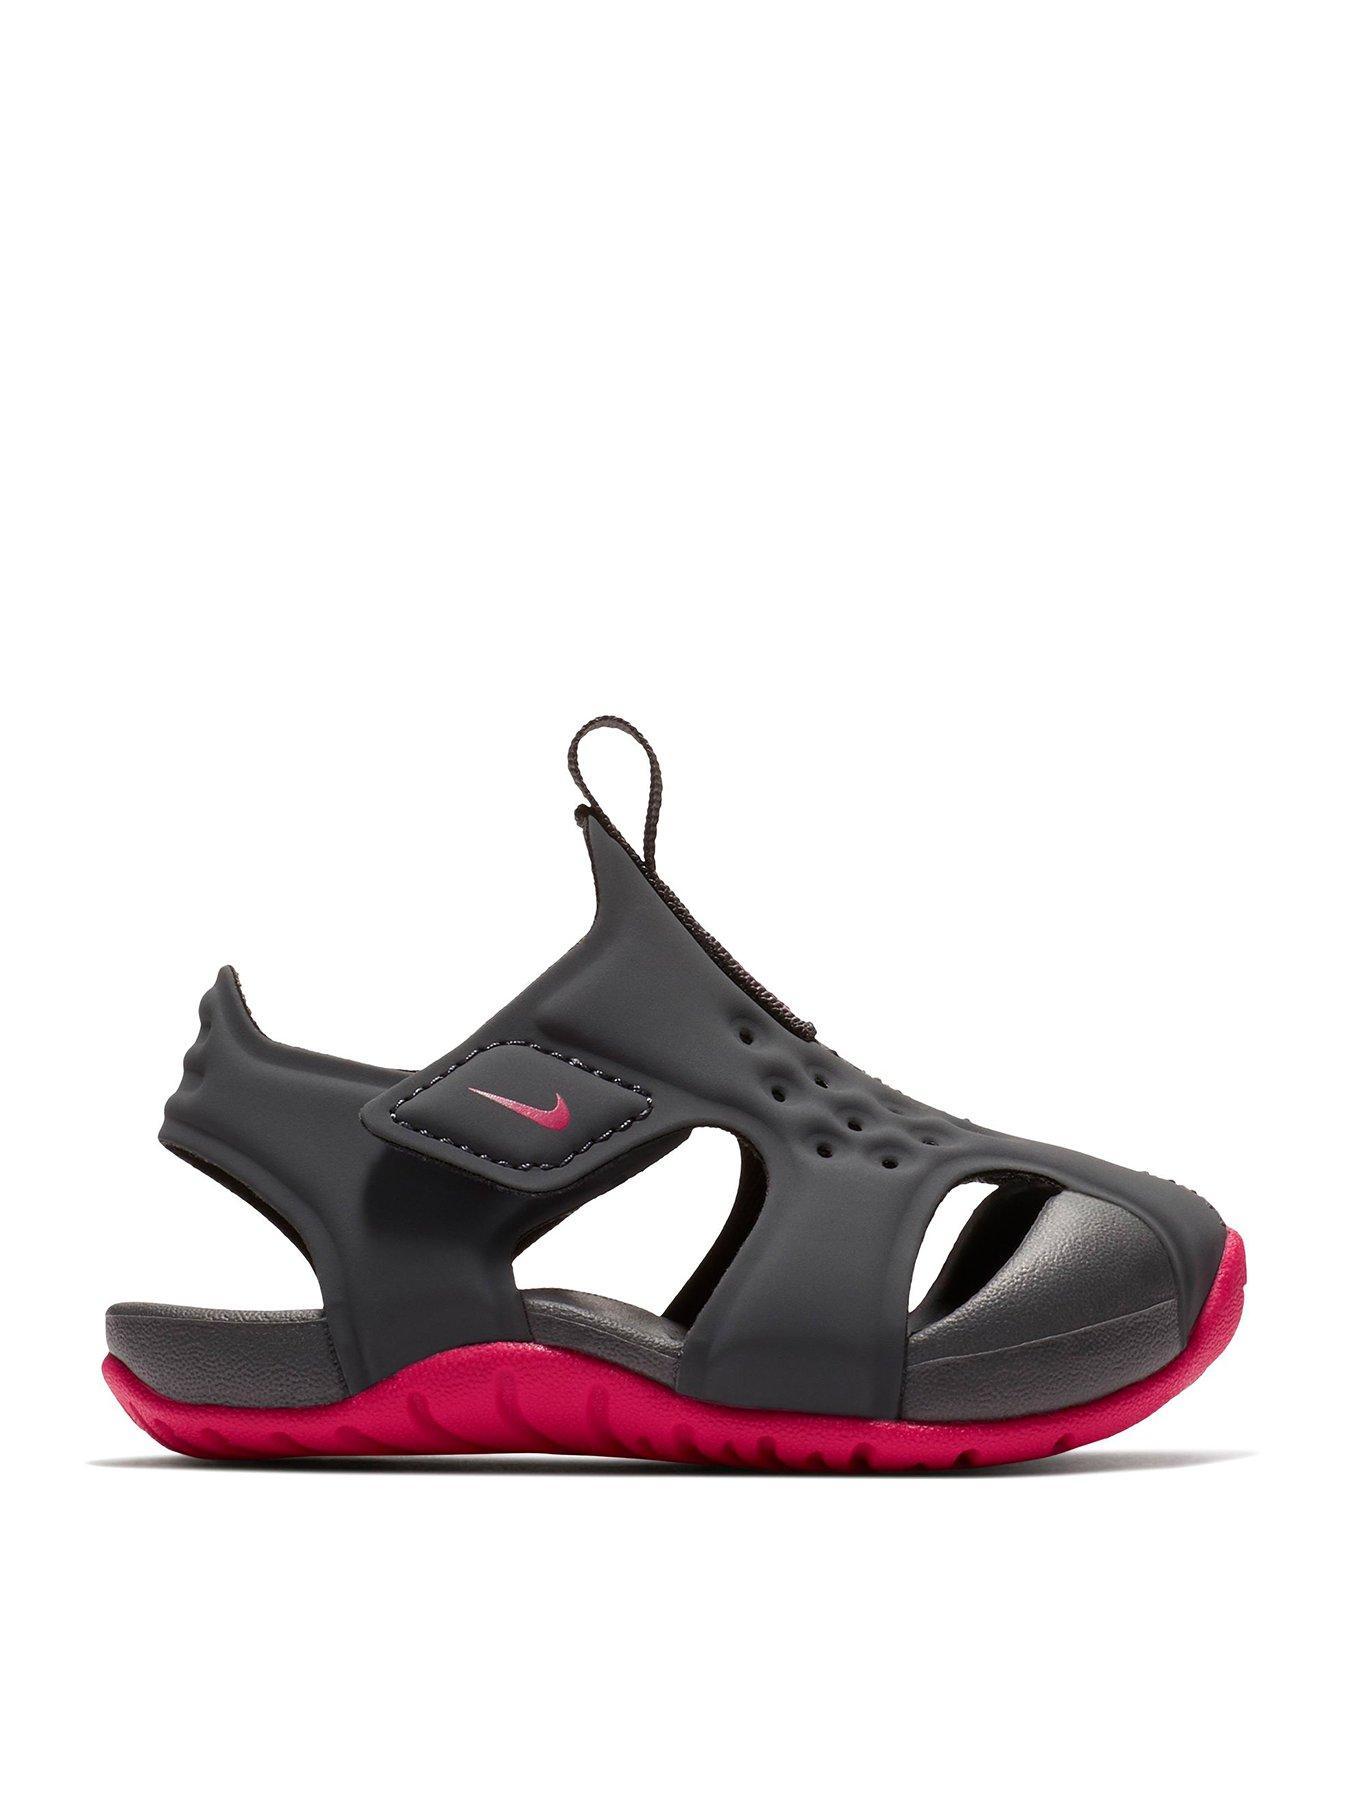 b6c18444158c9 amazon sunray protect nike sandals 8e524 d5942